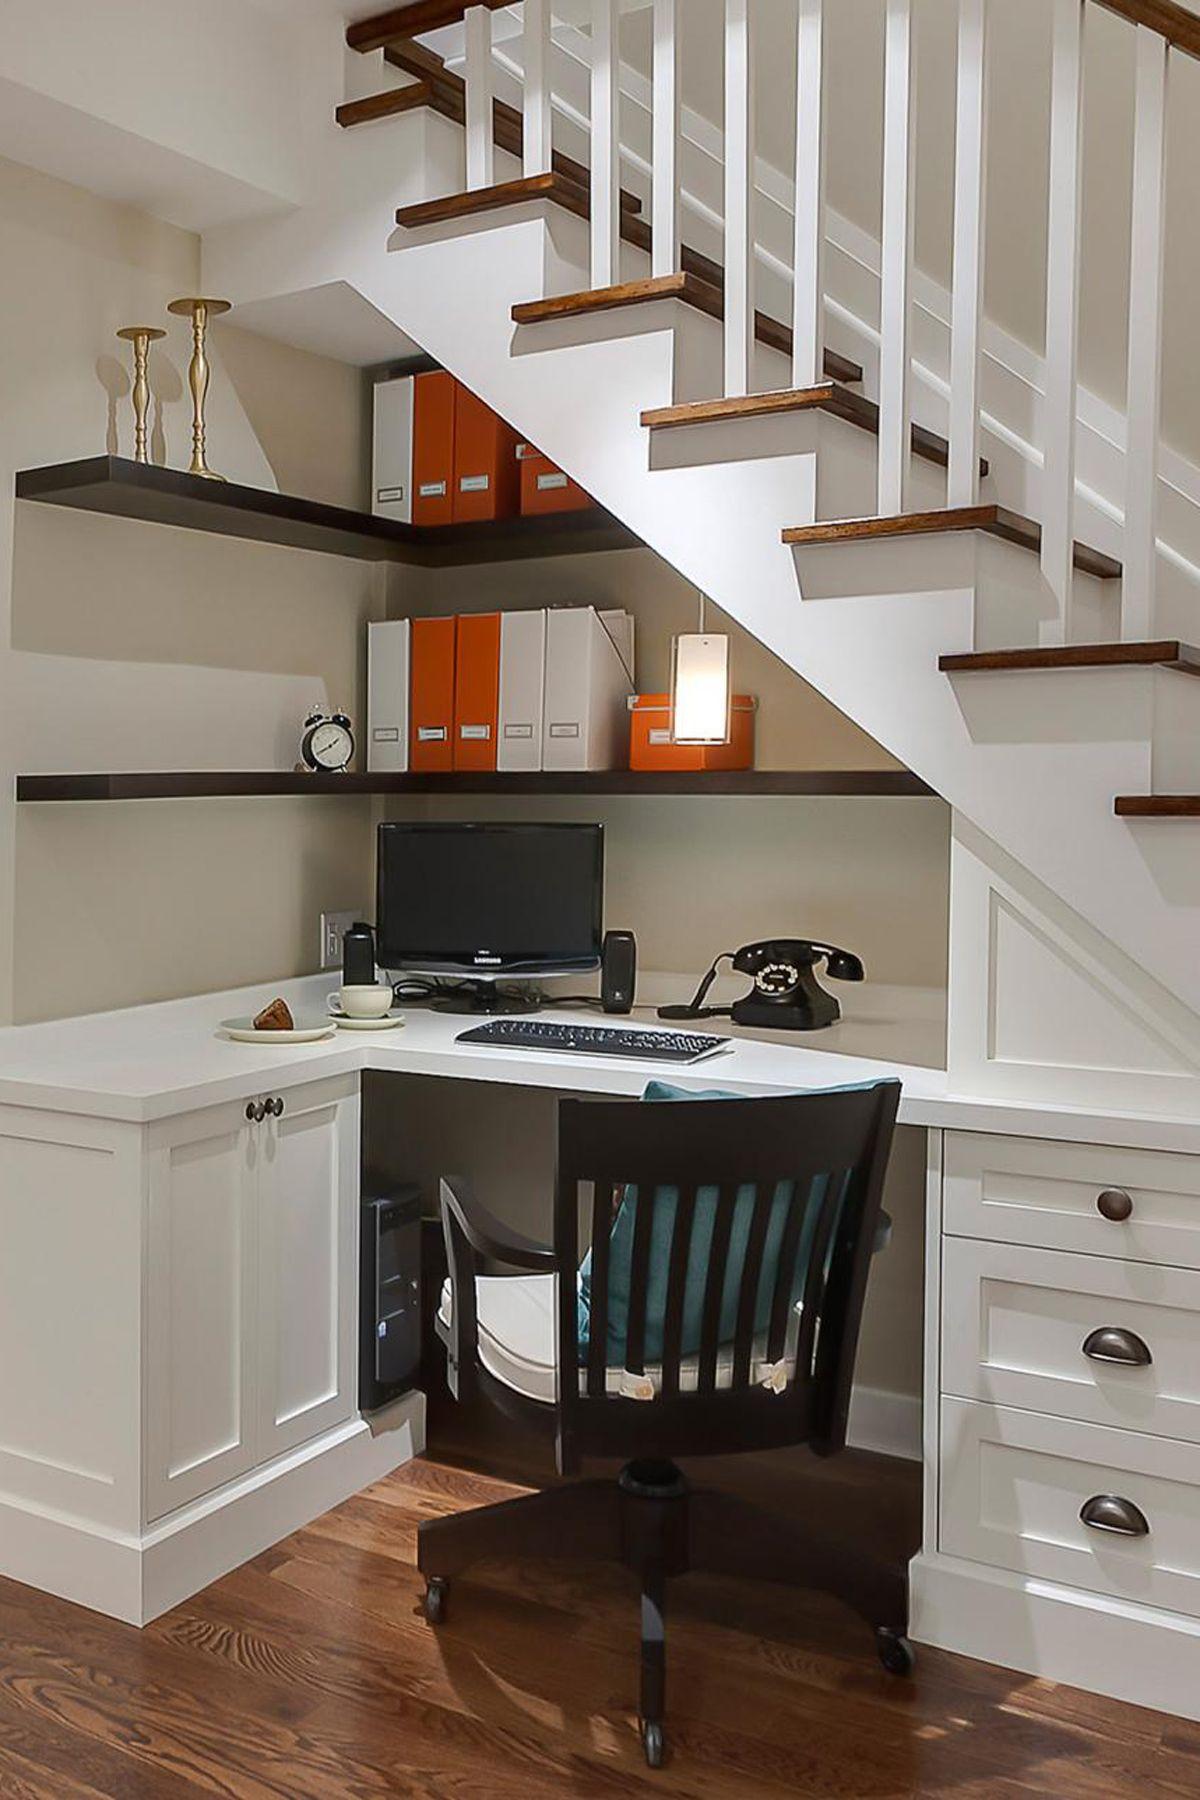 Sage Design Studio Inc. & 15 Genius under Stairs Storage Ideas - What to Do With Empty Space ...